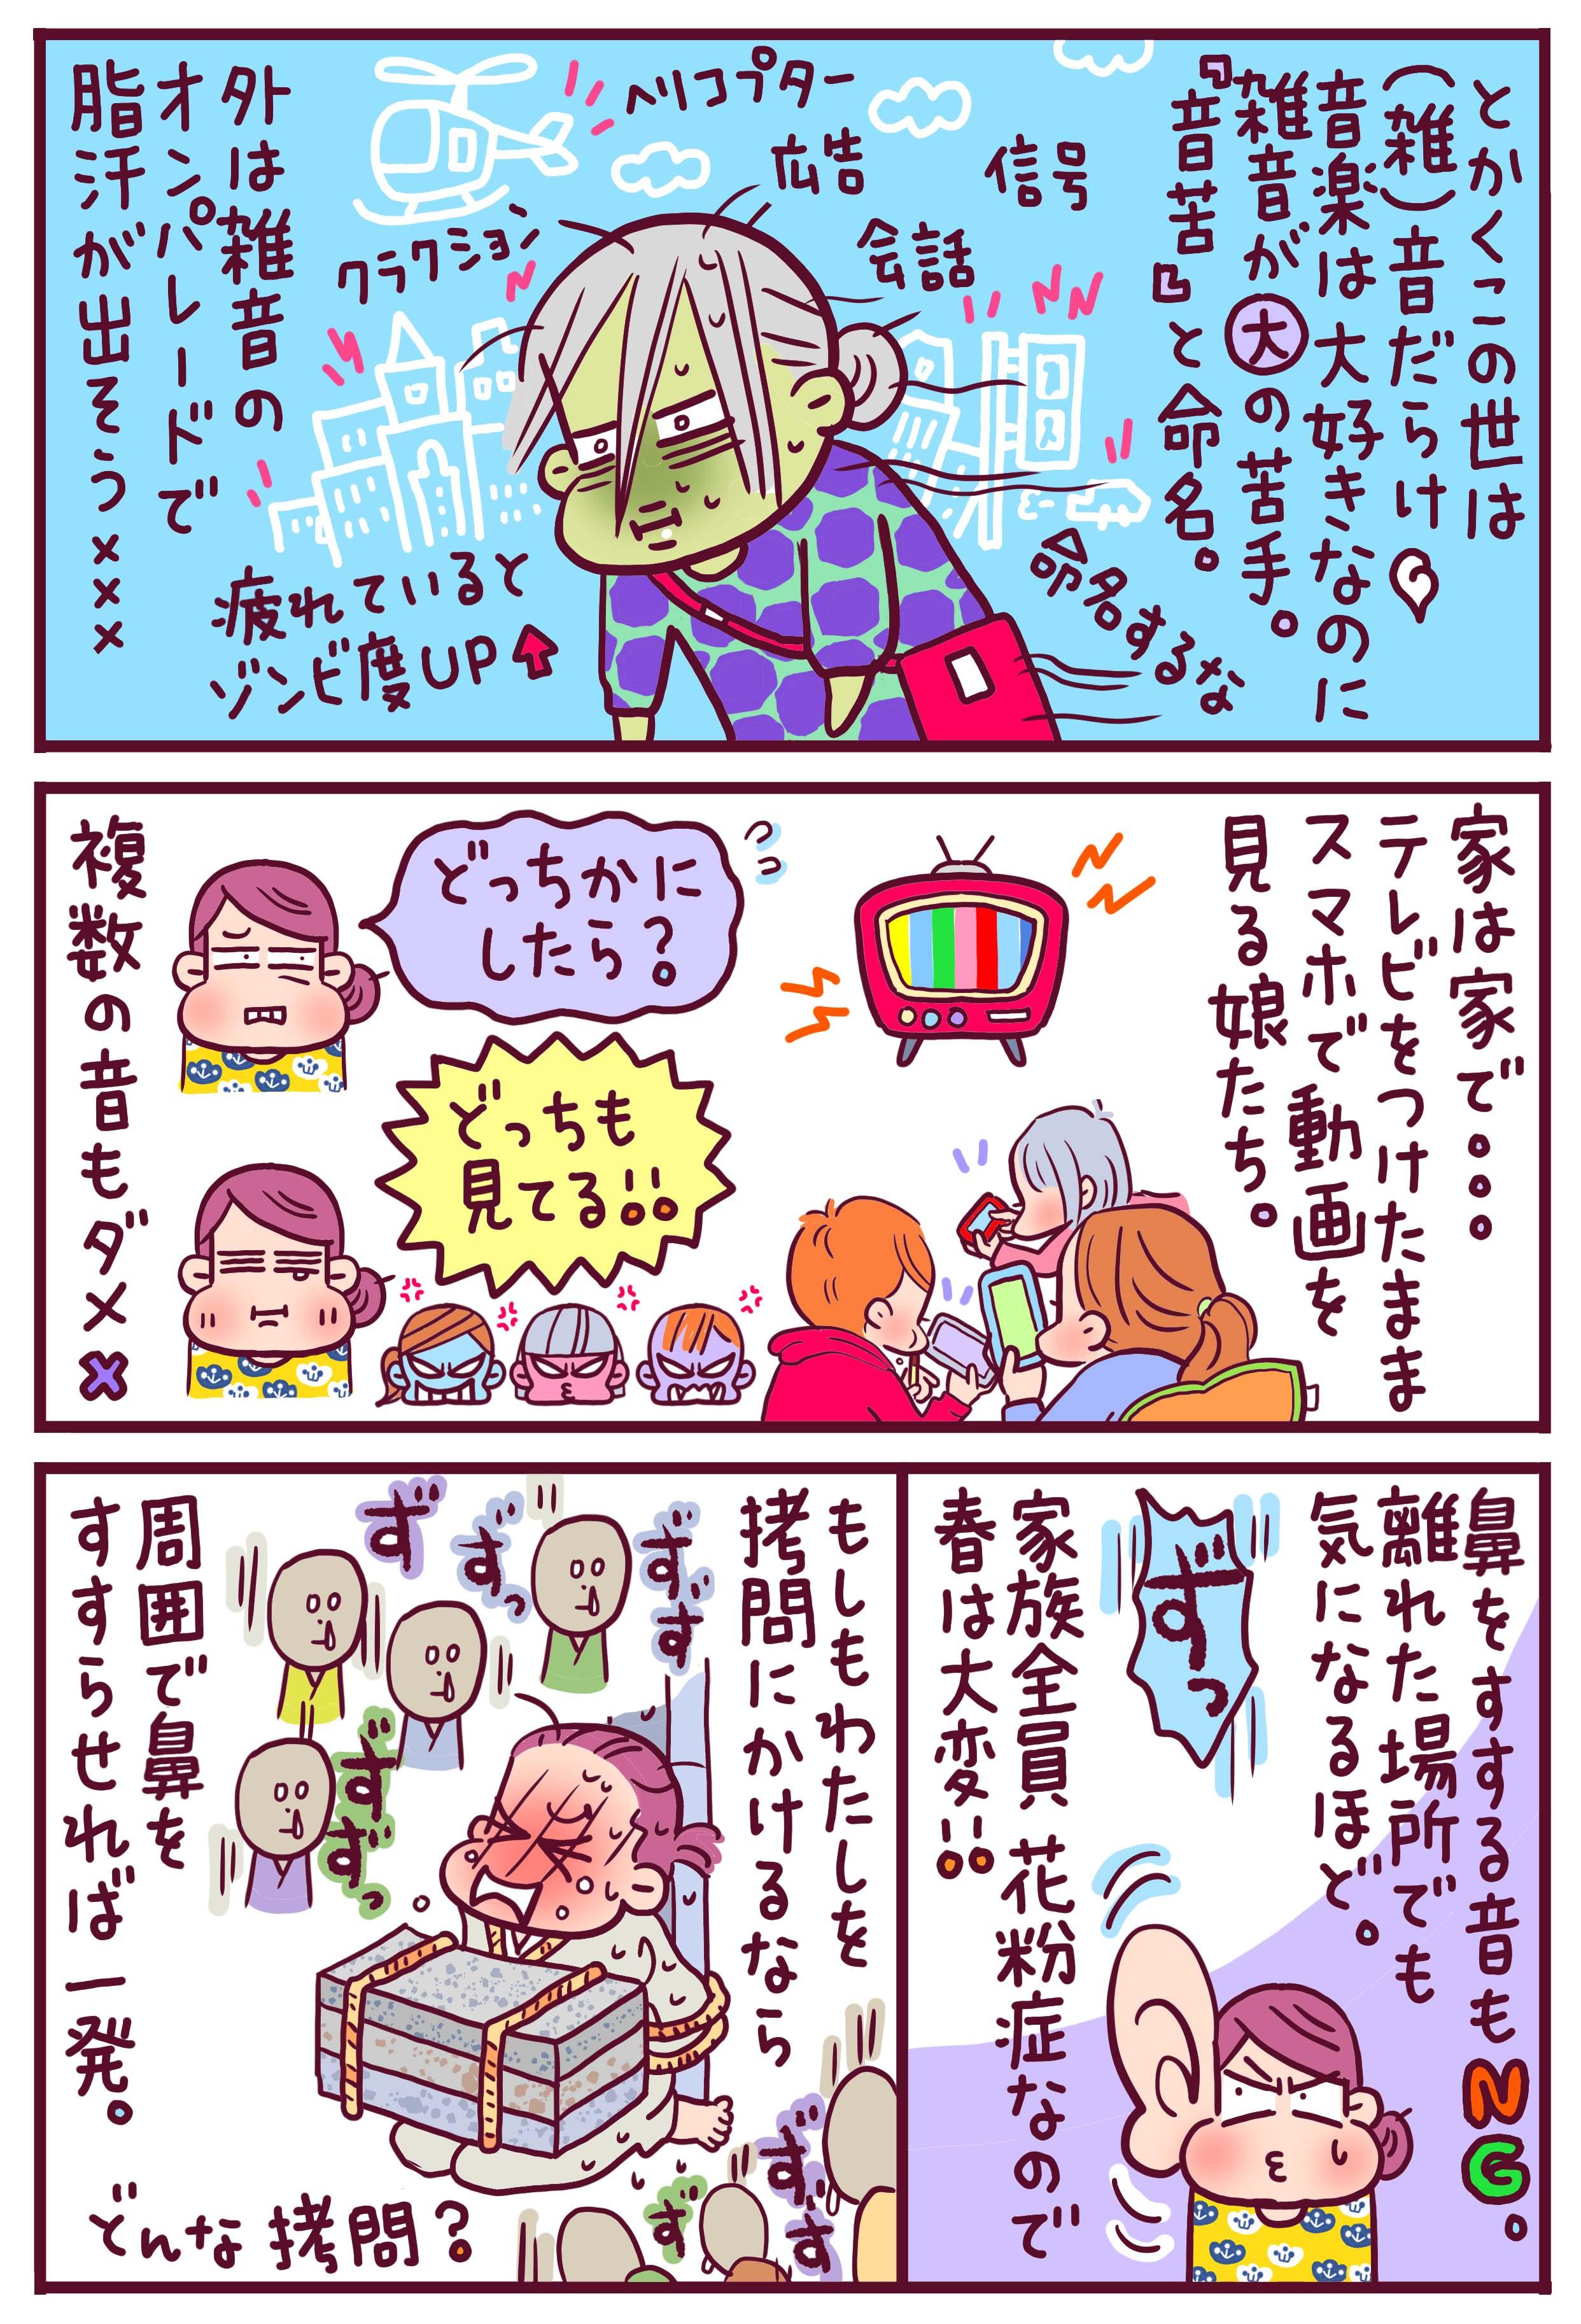 HSPマンガ(高野優)解決編